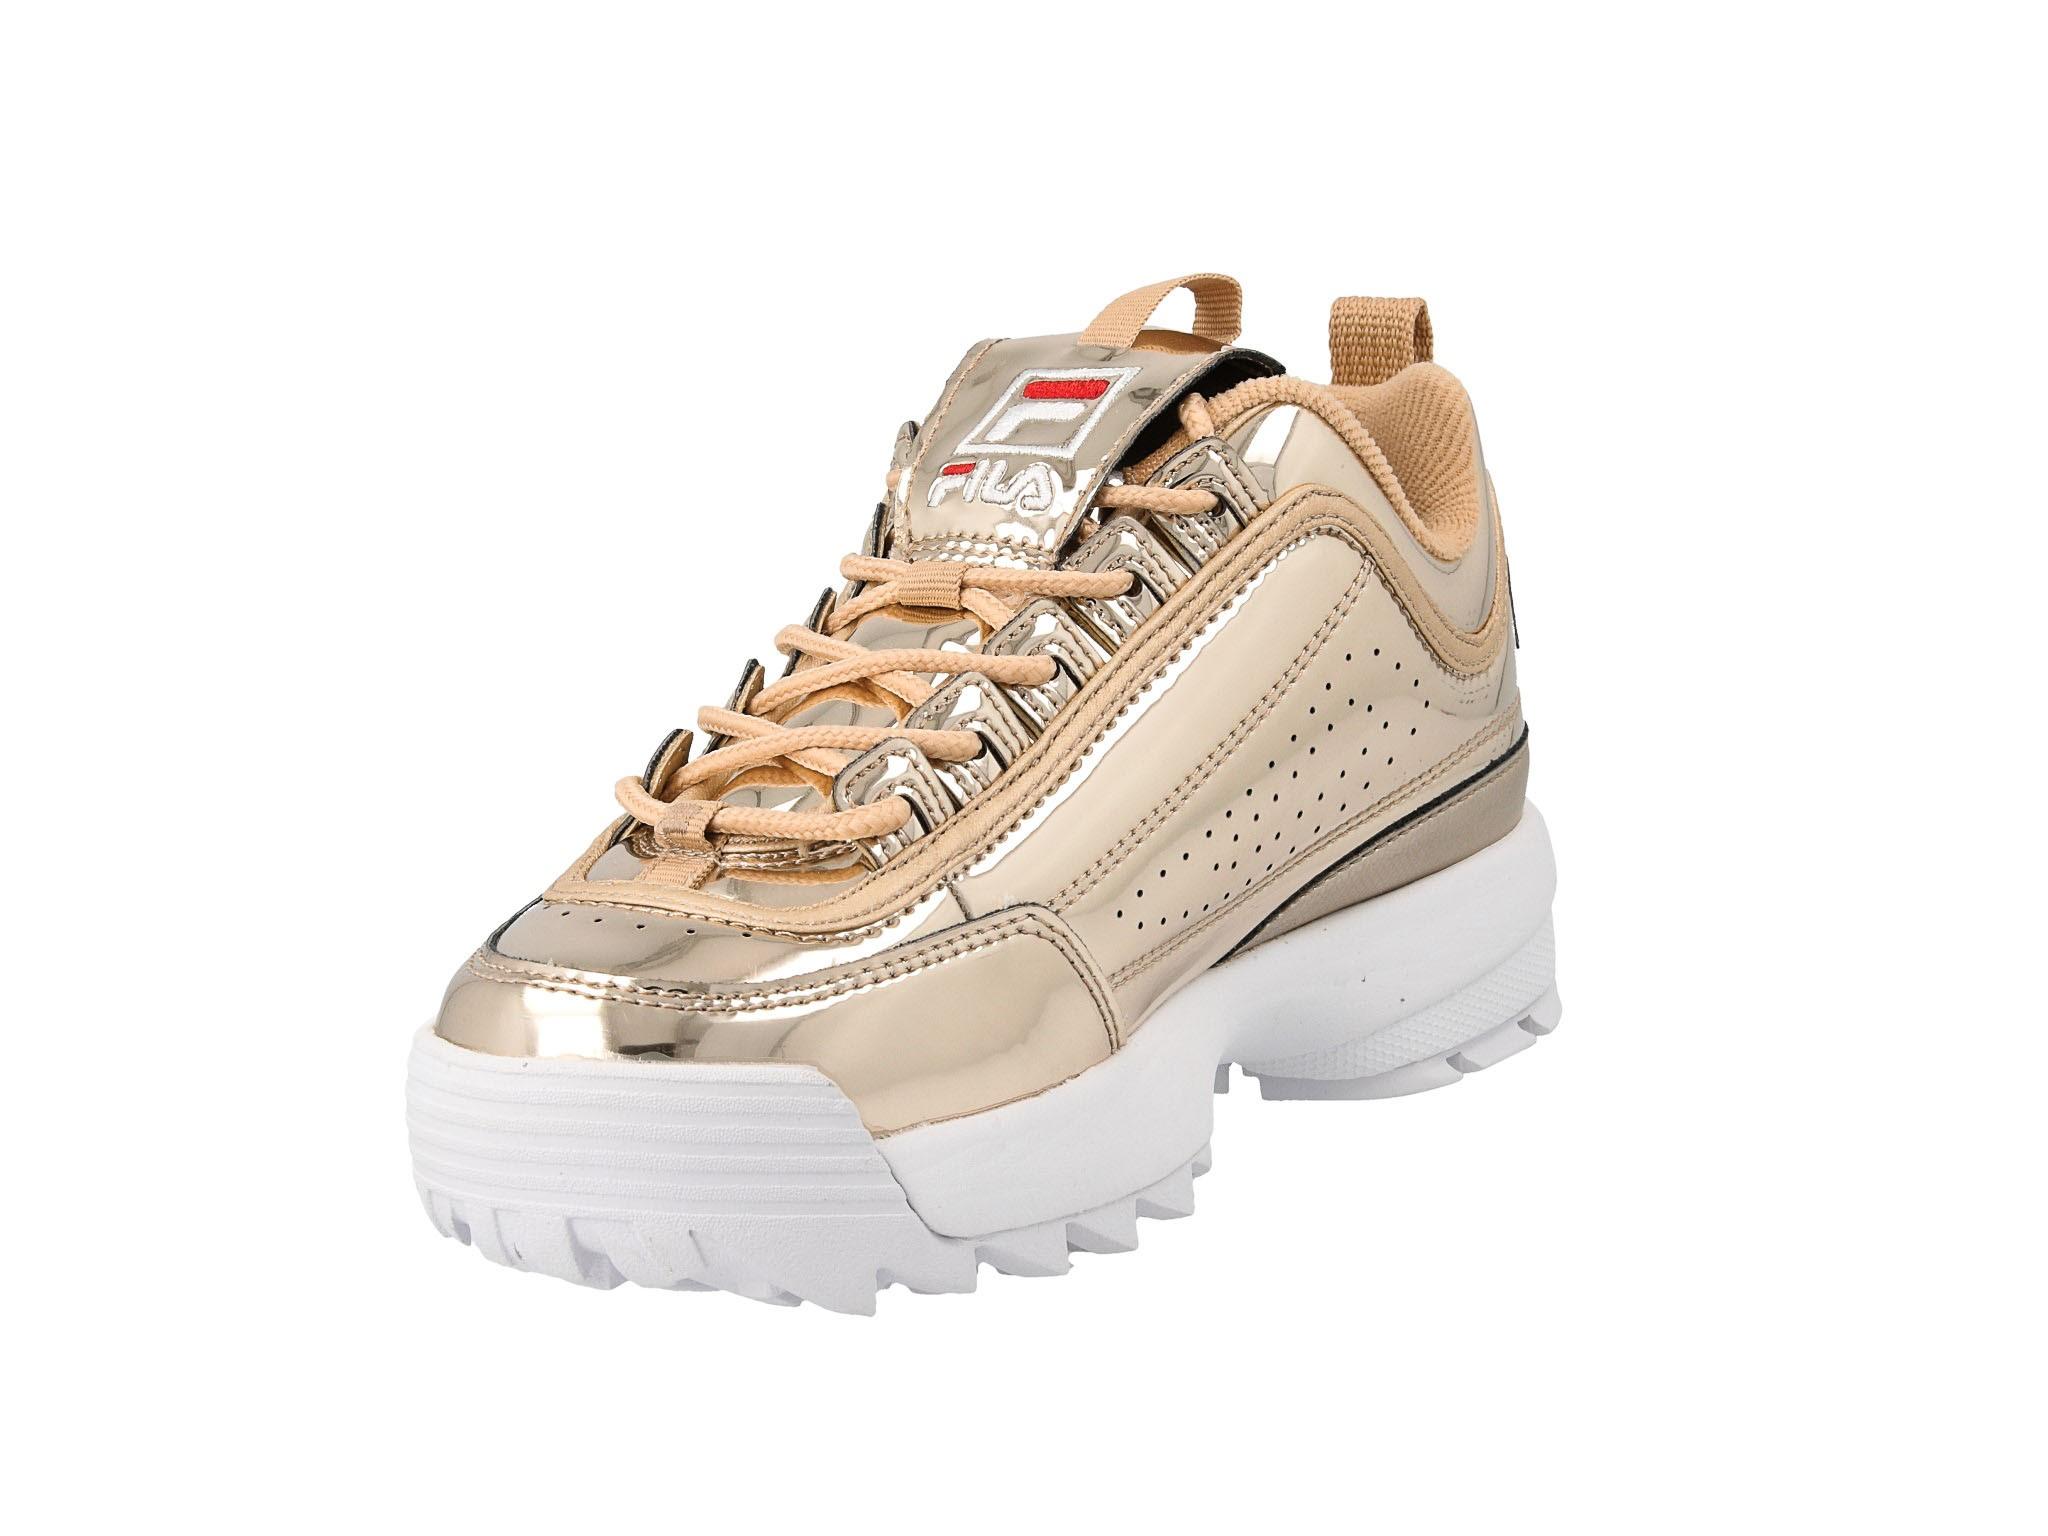 Buty damskie sneakersy Fila Disruptor M Low 1010608 80C